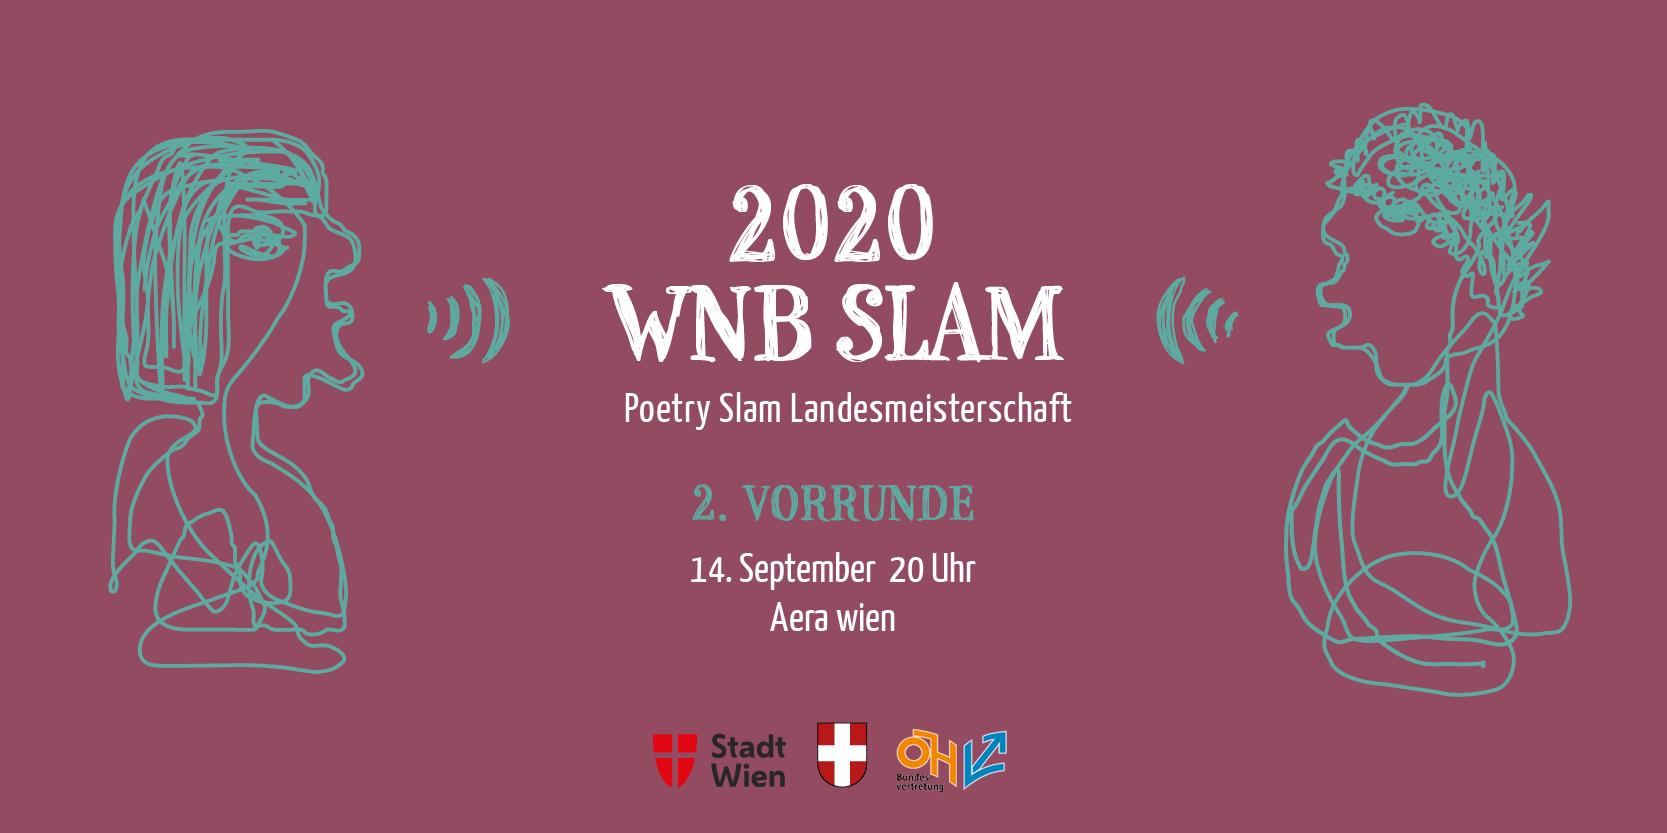 WNB SLAM 2020 Vorrunde 2 am 14. September 2020 @ Aera.